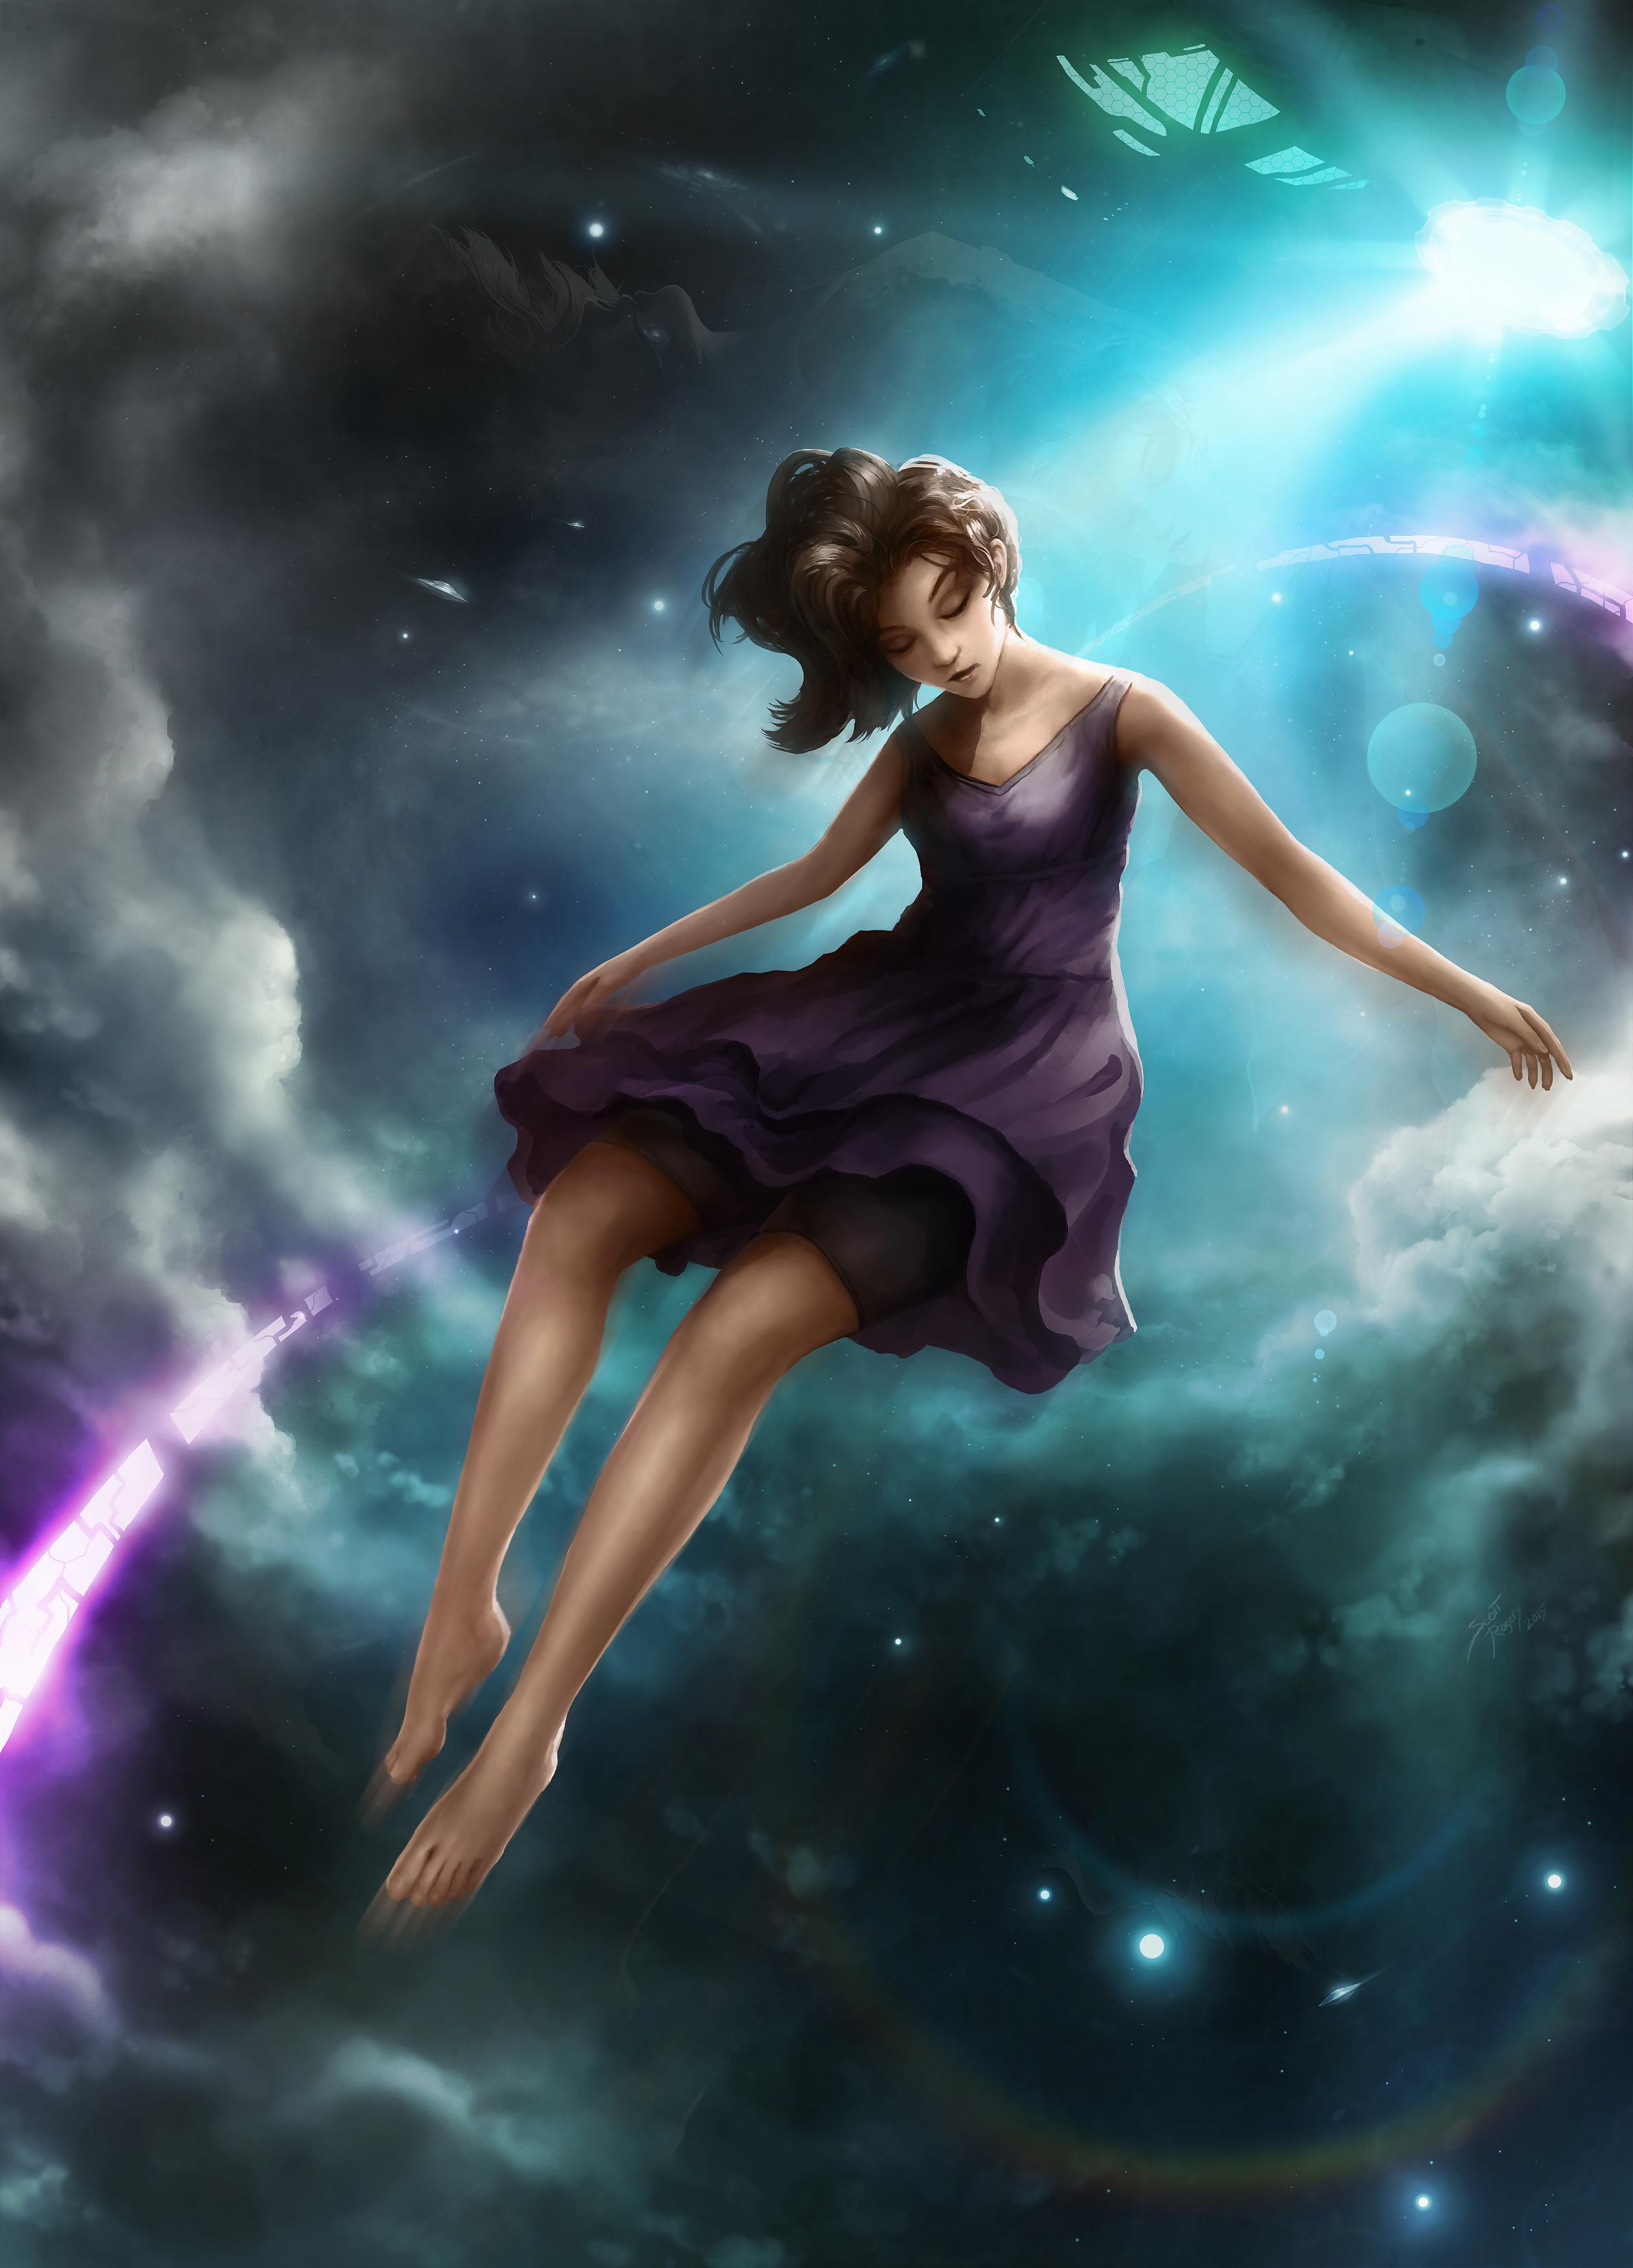 Veil of Dreams